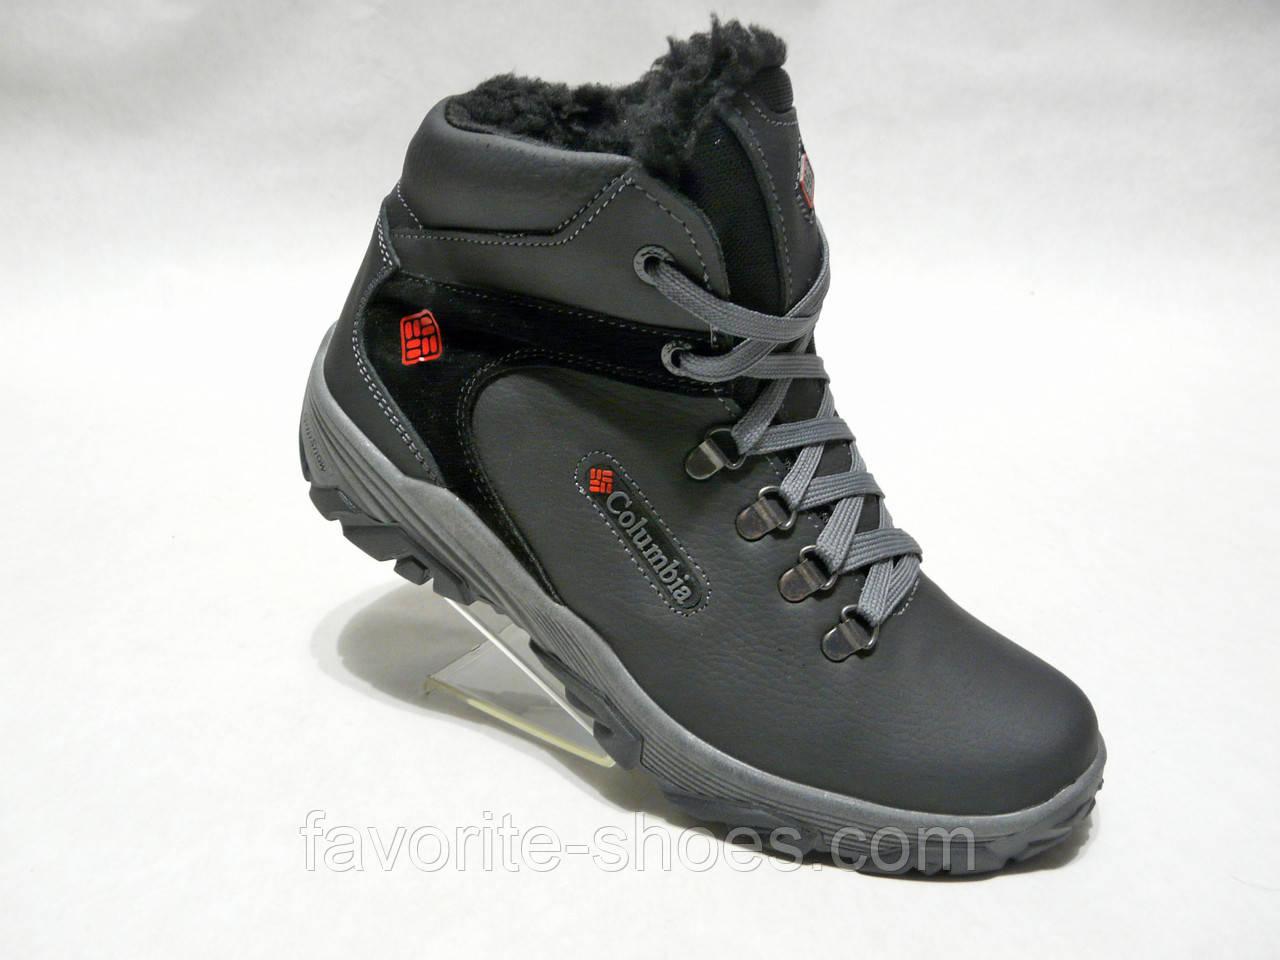 ae47be34a02b Зимние мужские кожаные ботинки Columbia 601 - Интернет - магазин